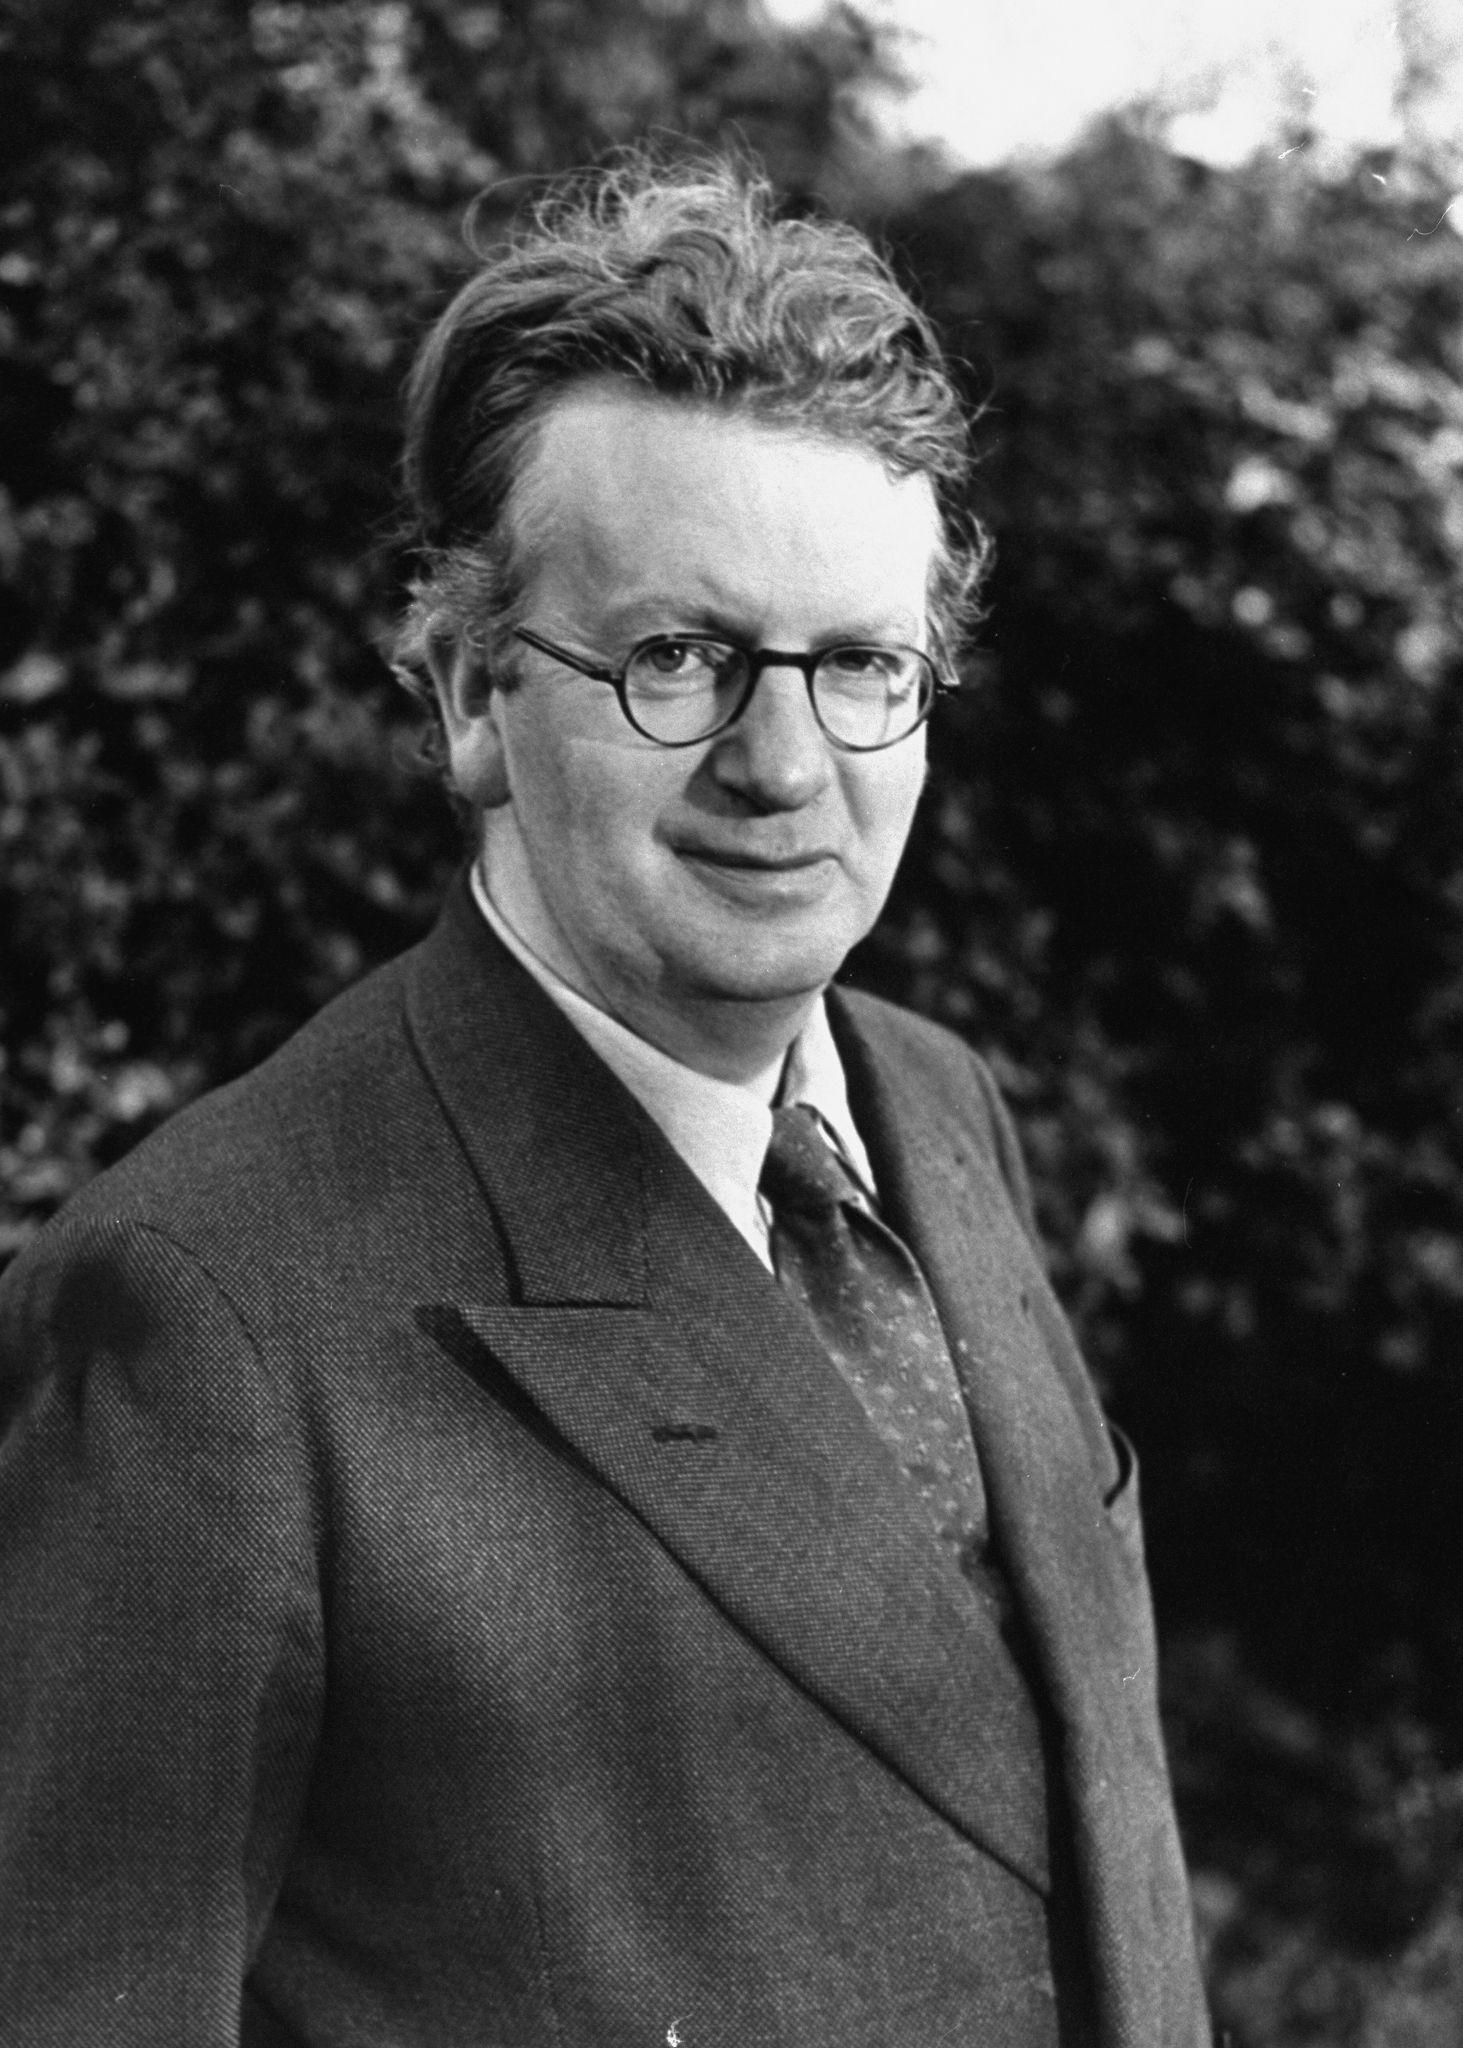 John Logie Baird born in Helensburgh, Dunbartonshire